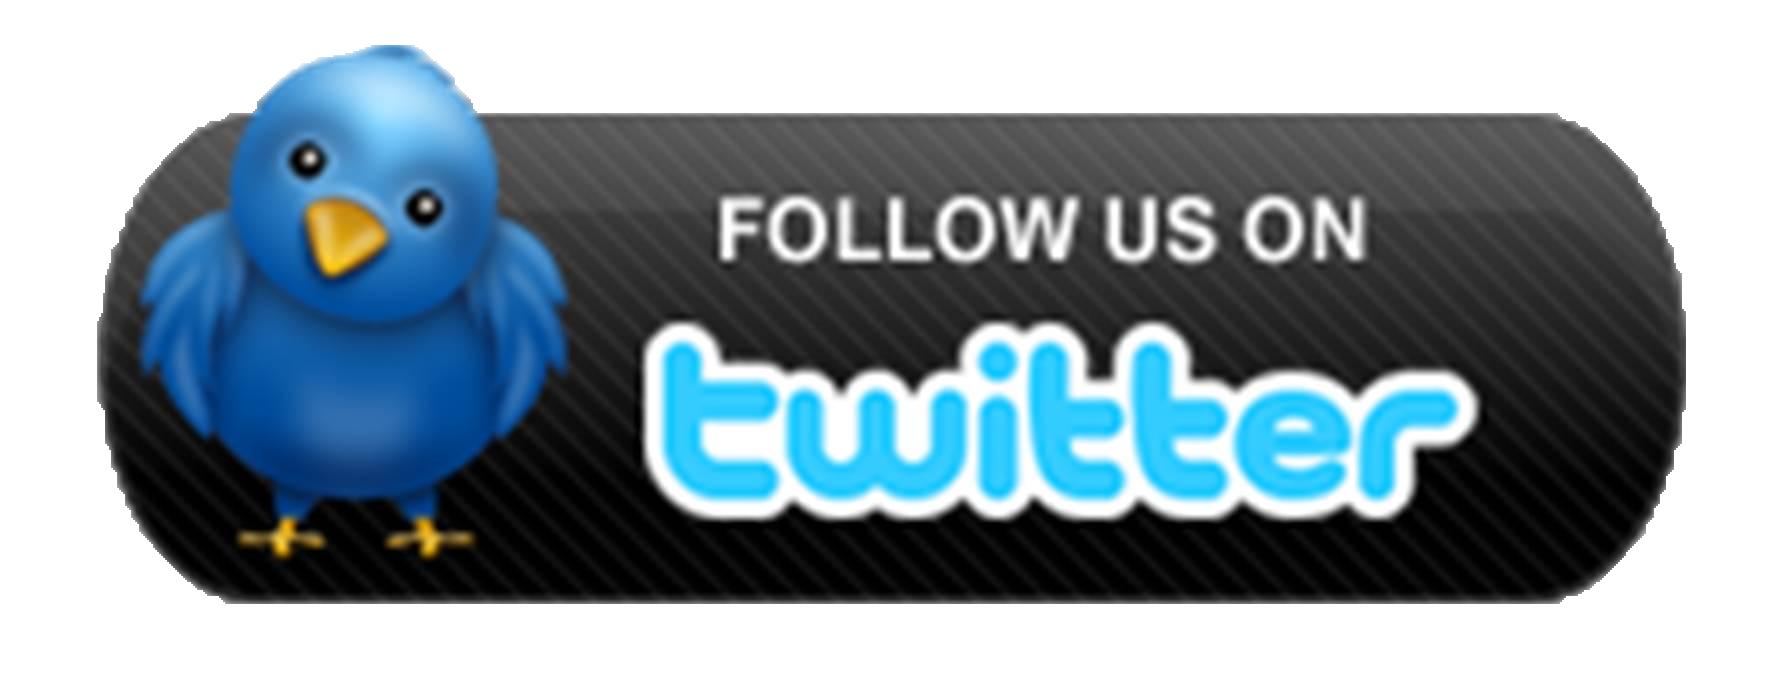 Utah department of heritage. Follow us on twitter png